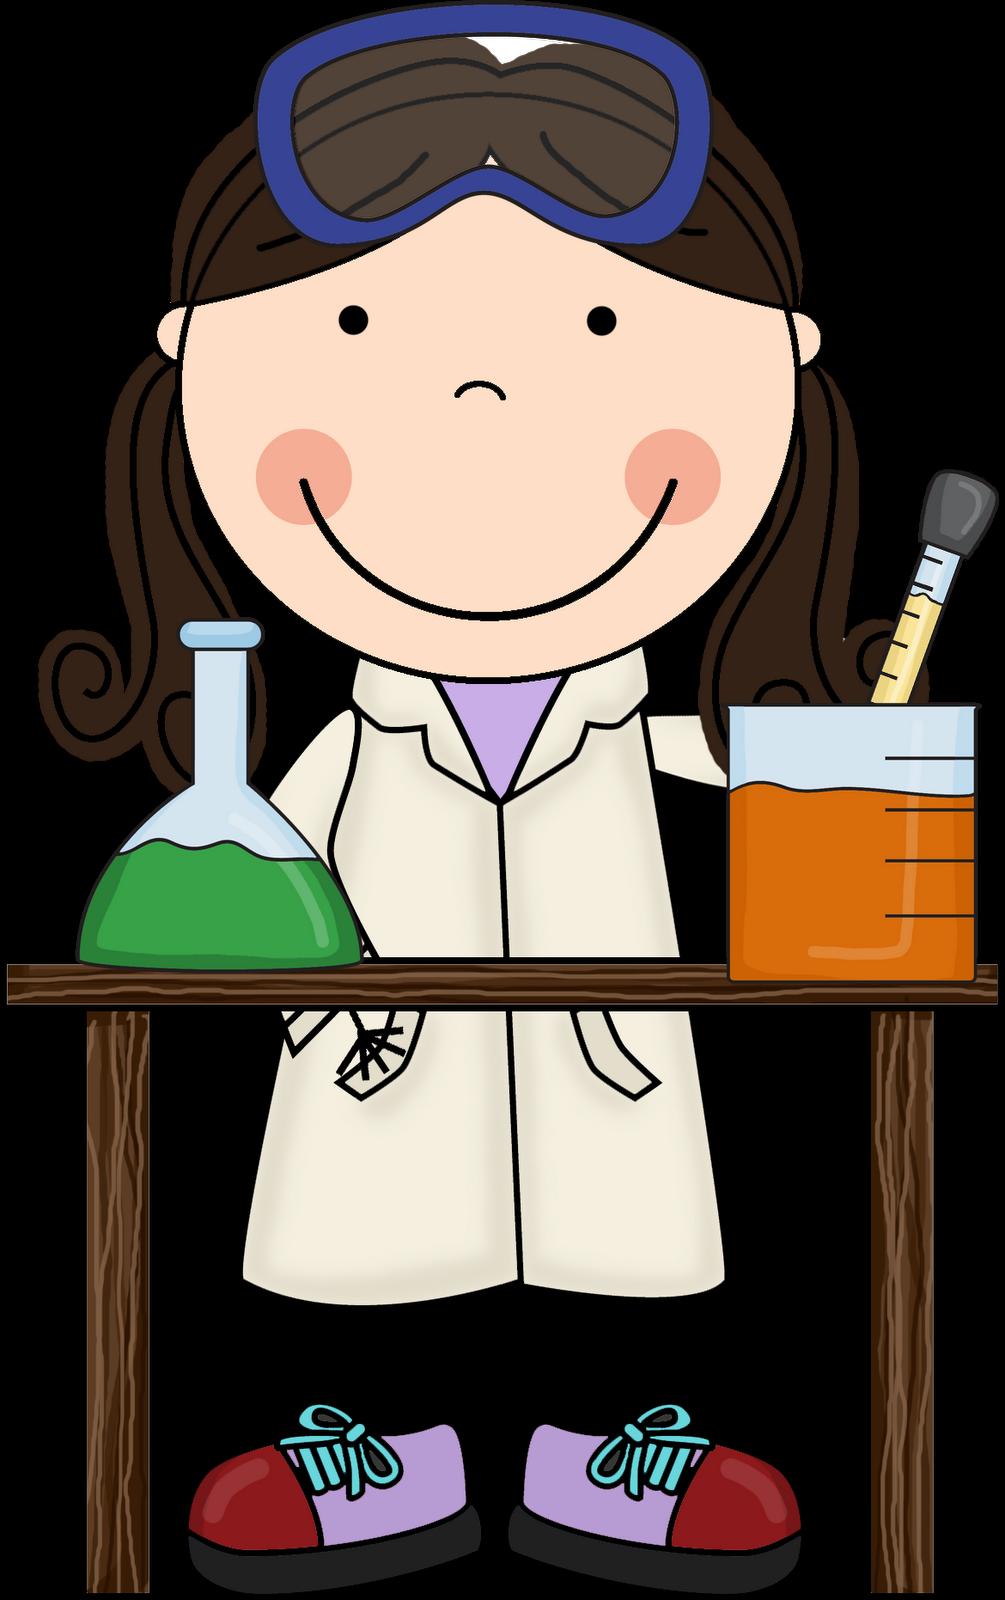 Laboratory clipart science experiment Clipart Experiment Clipart Free School